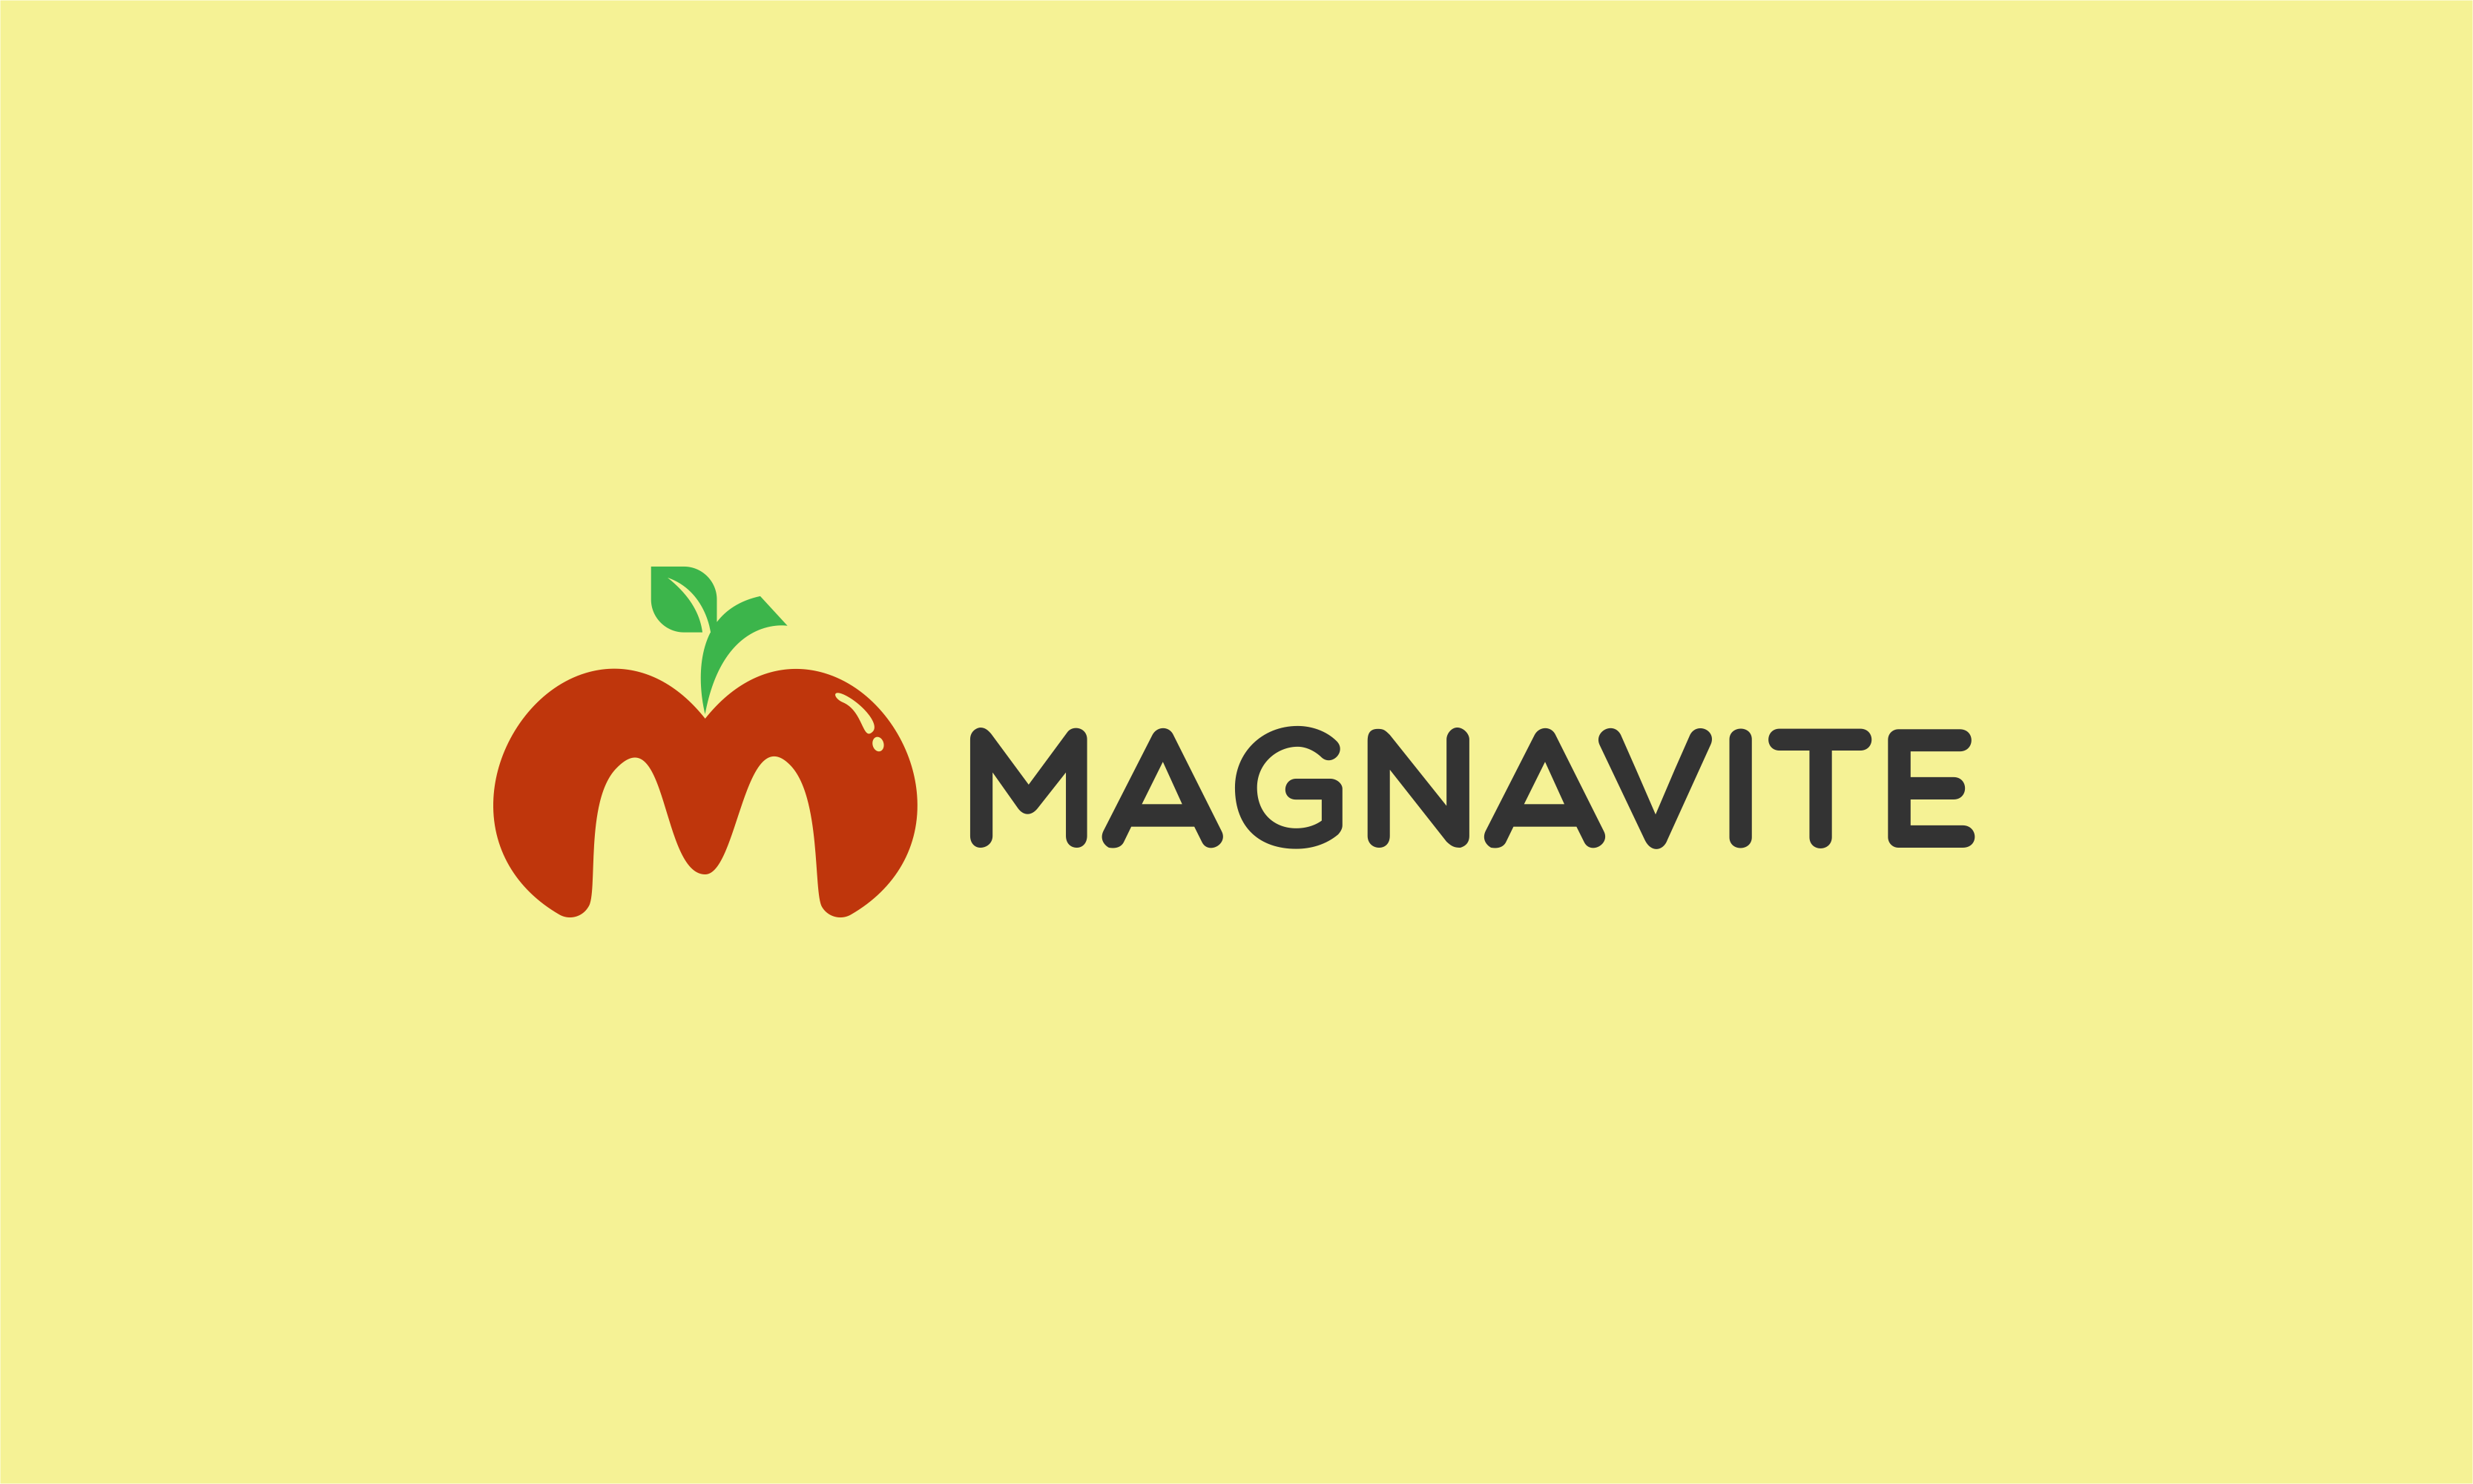 Magnavite